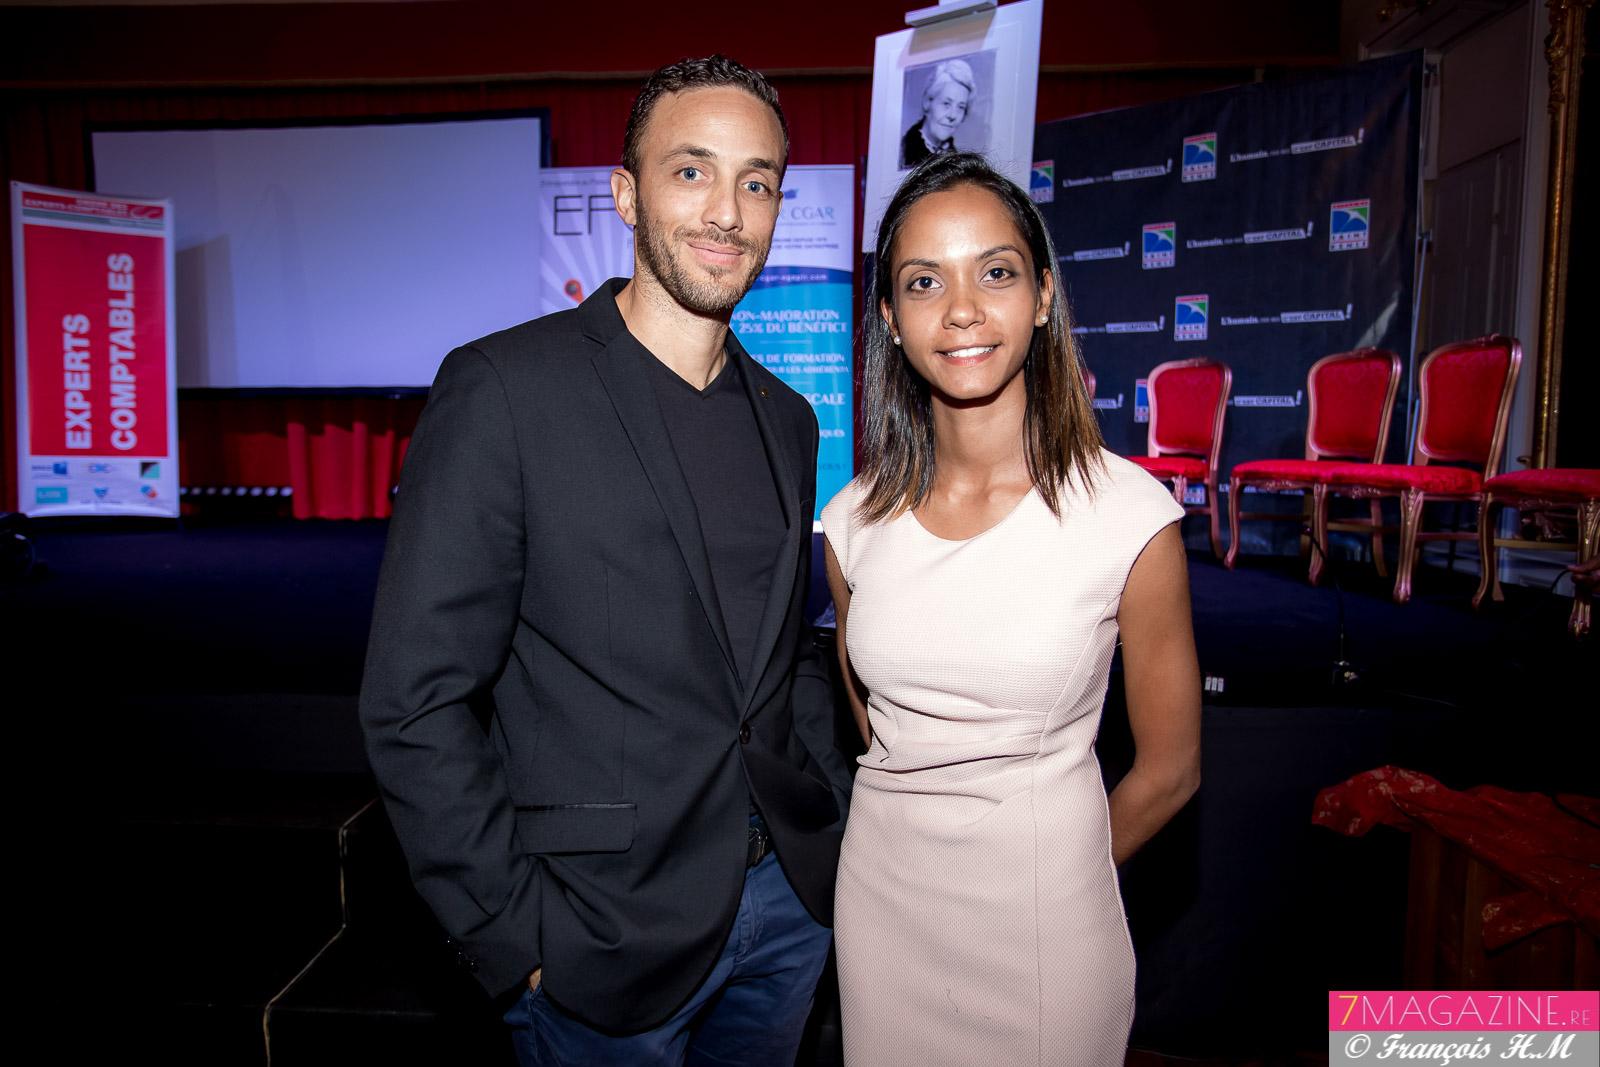 Nisma Utteemun, Prix Julie Mas 2017, et son associé Fabrice Alanoix